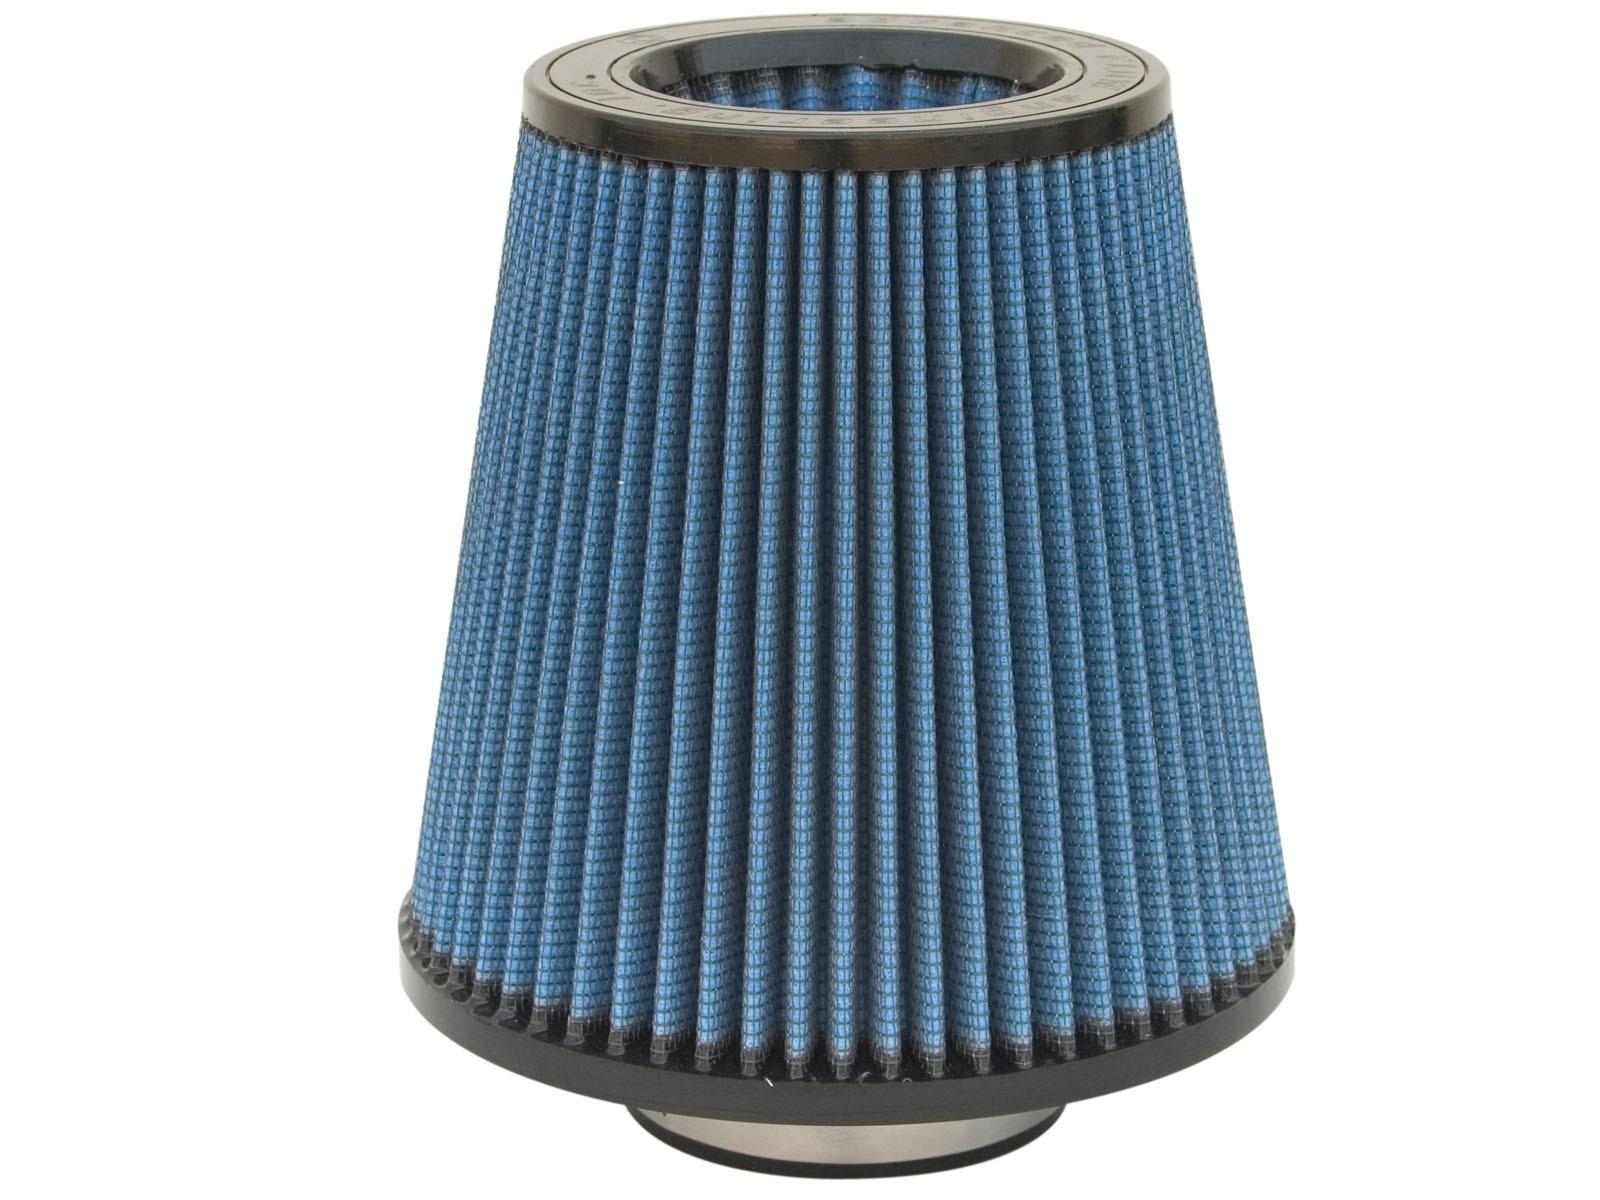 aFe POWER 24-91008 Magnum FLOW Pro 5R Air Filter